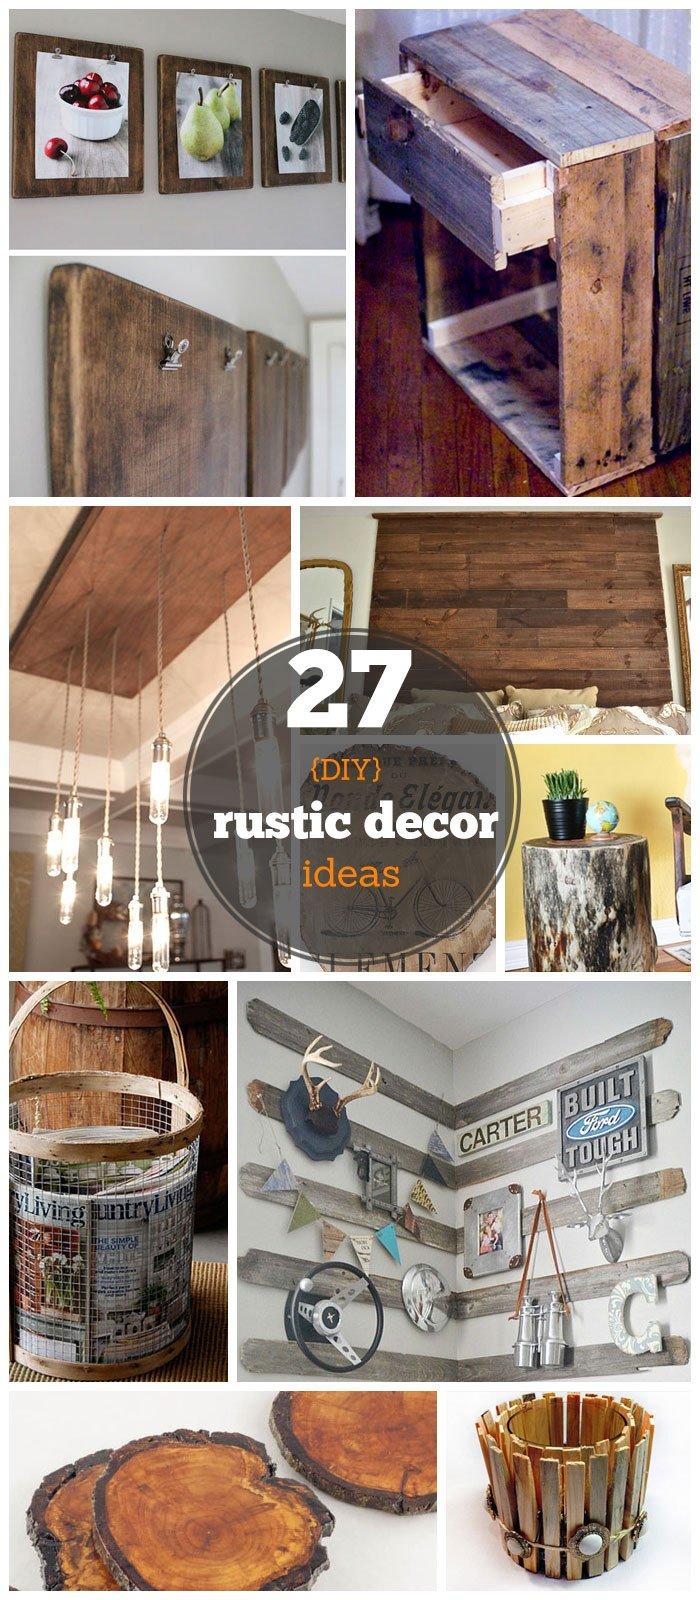 Home Decor On A Budget Elegant 27 Diy Rustic Decor Ideas for the Home